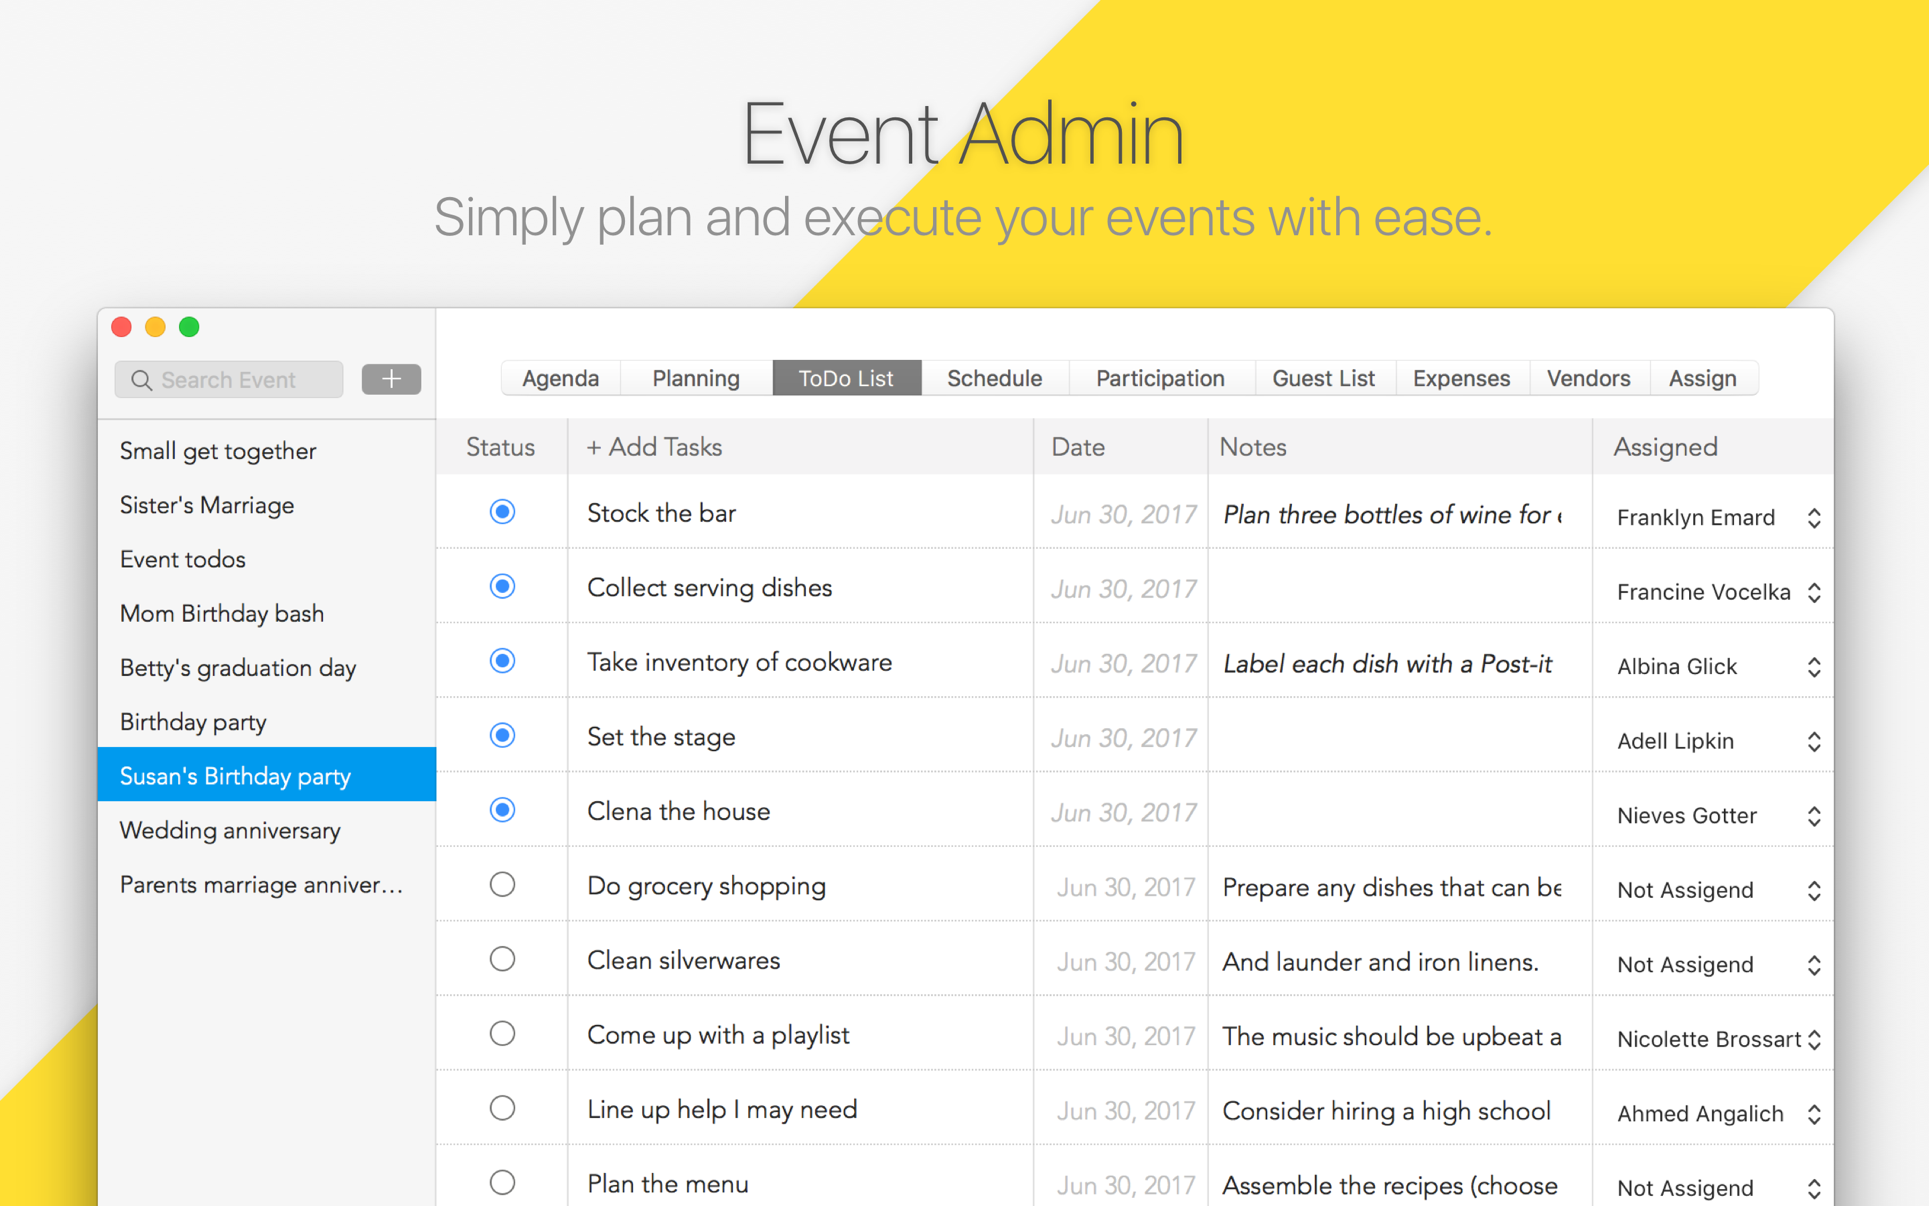 Event Admin